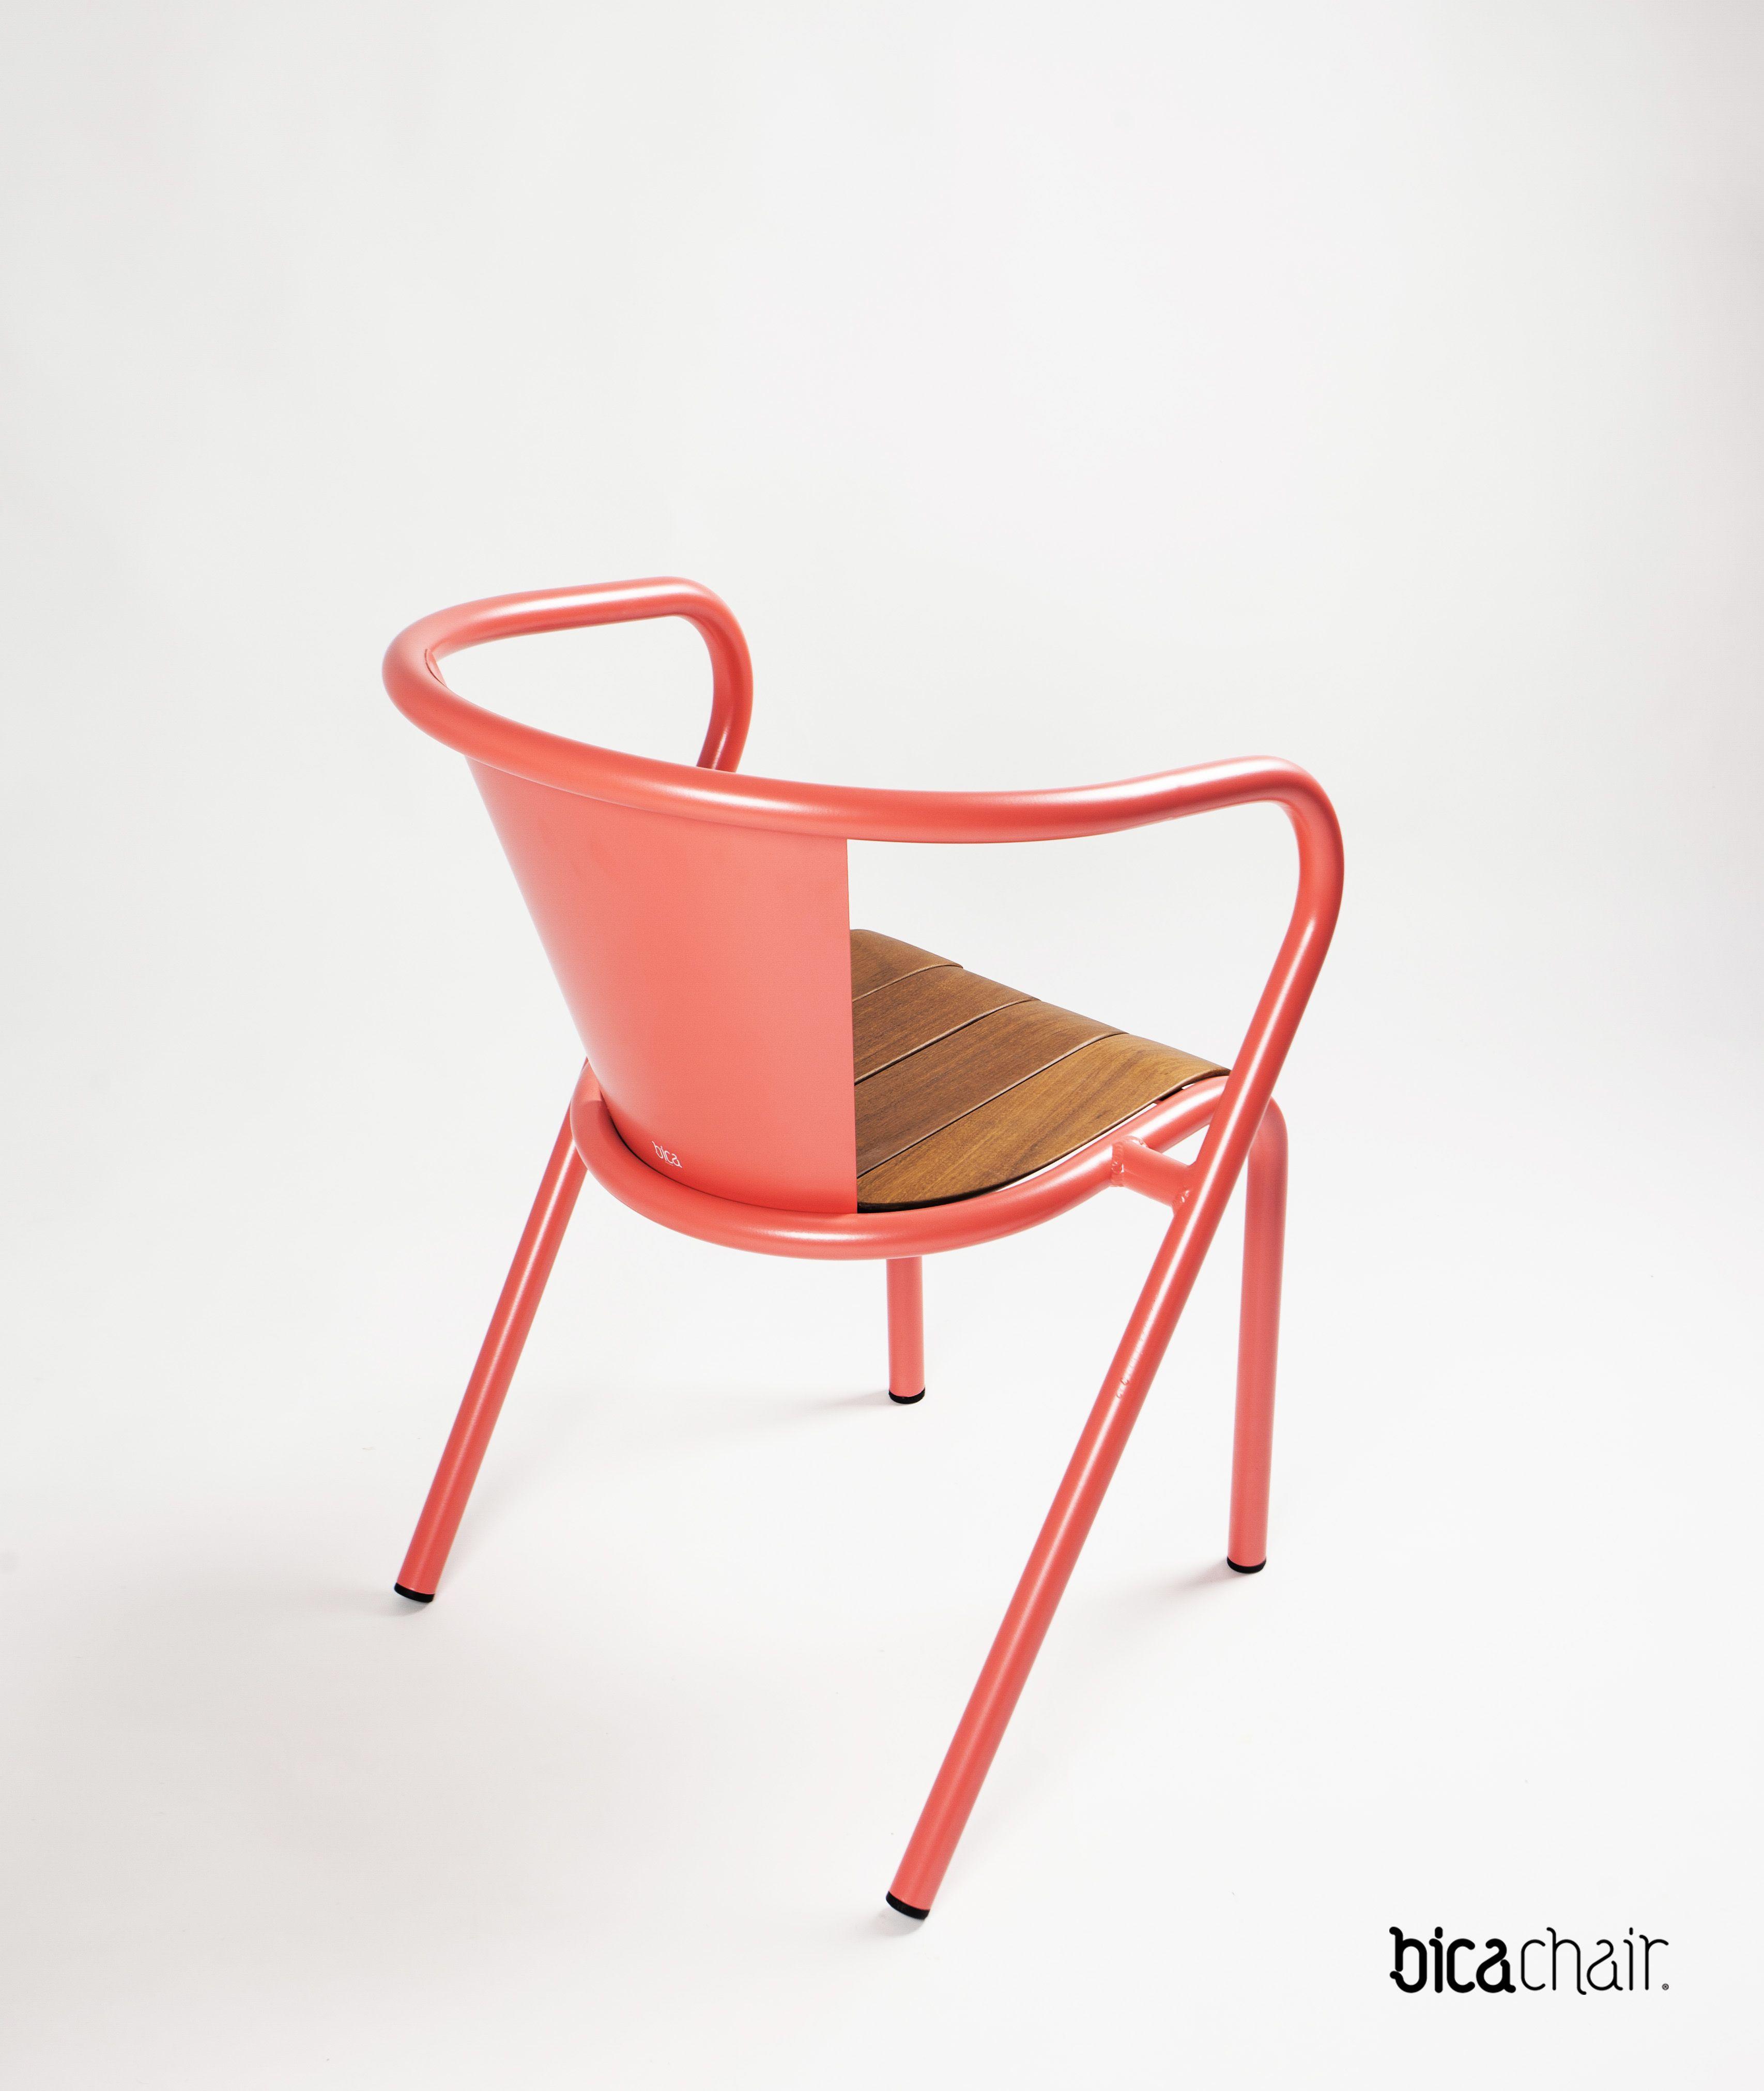 Home products chairs ics ipsilon - Bica Chair 1953